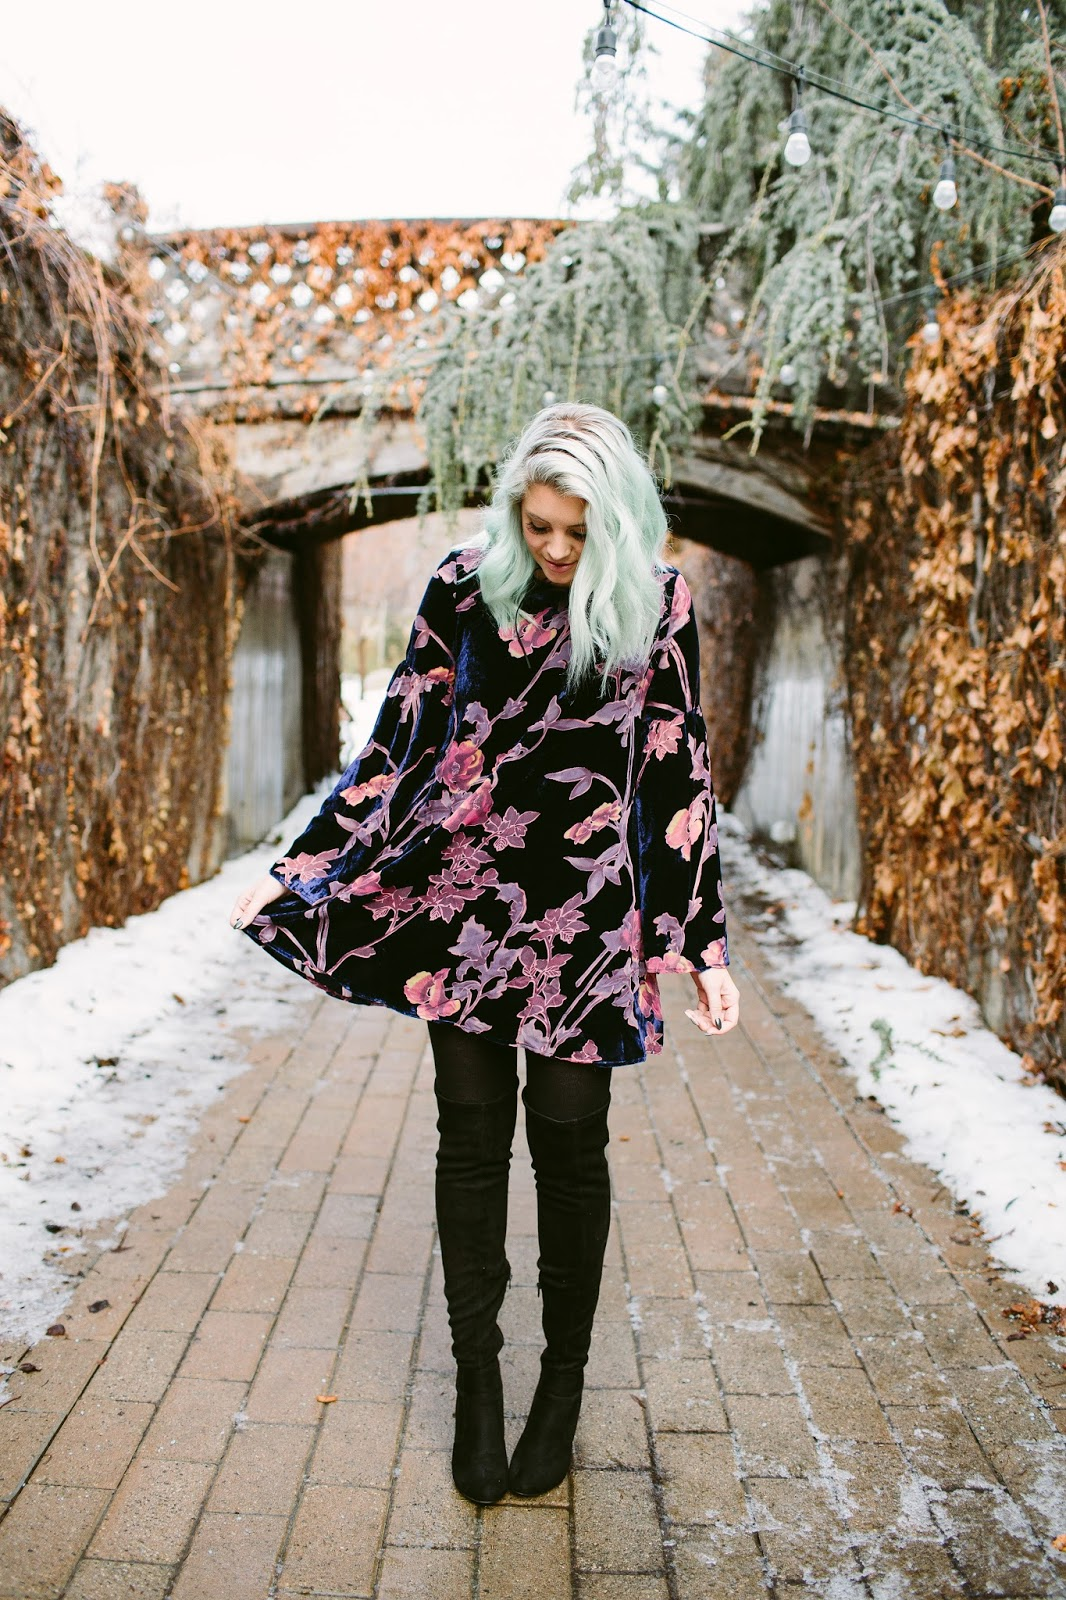 Velvet Dress, Floral Dress, Modest Outfit